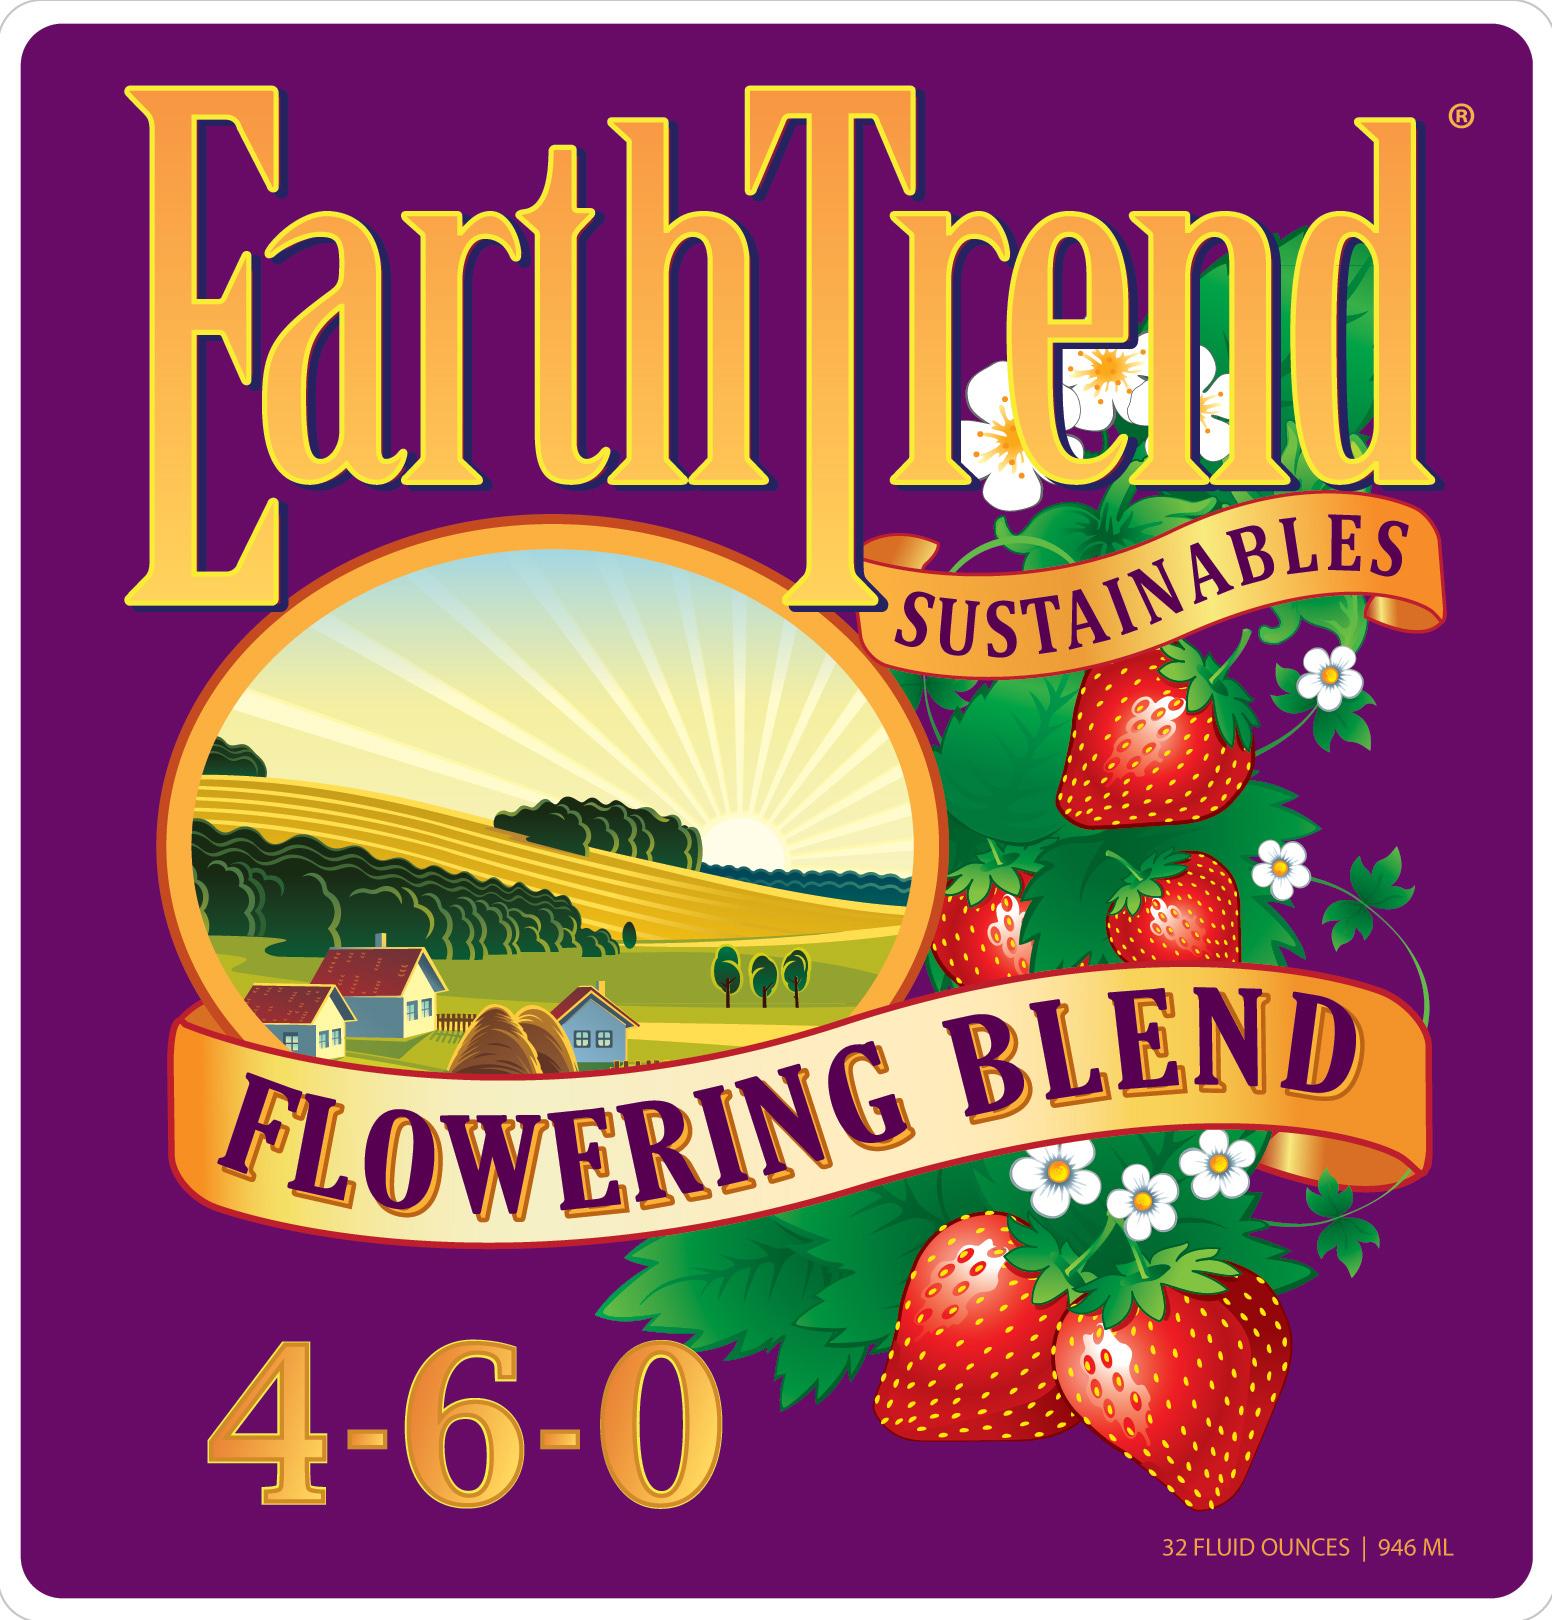 earthtrend flowering blend